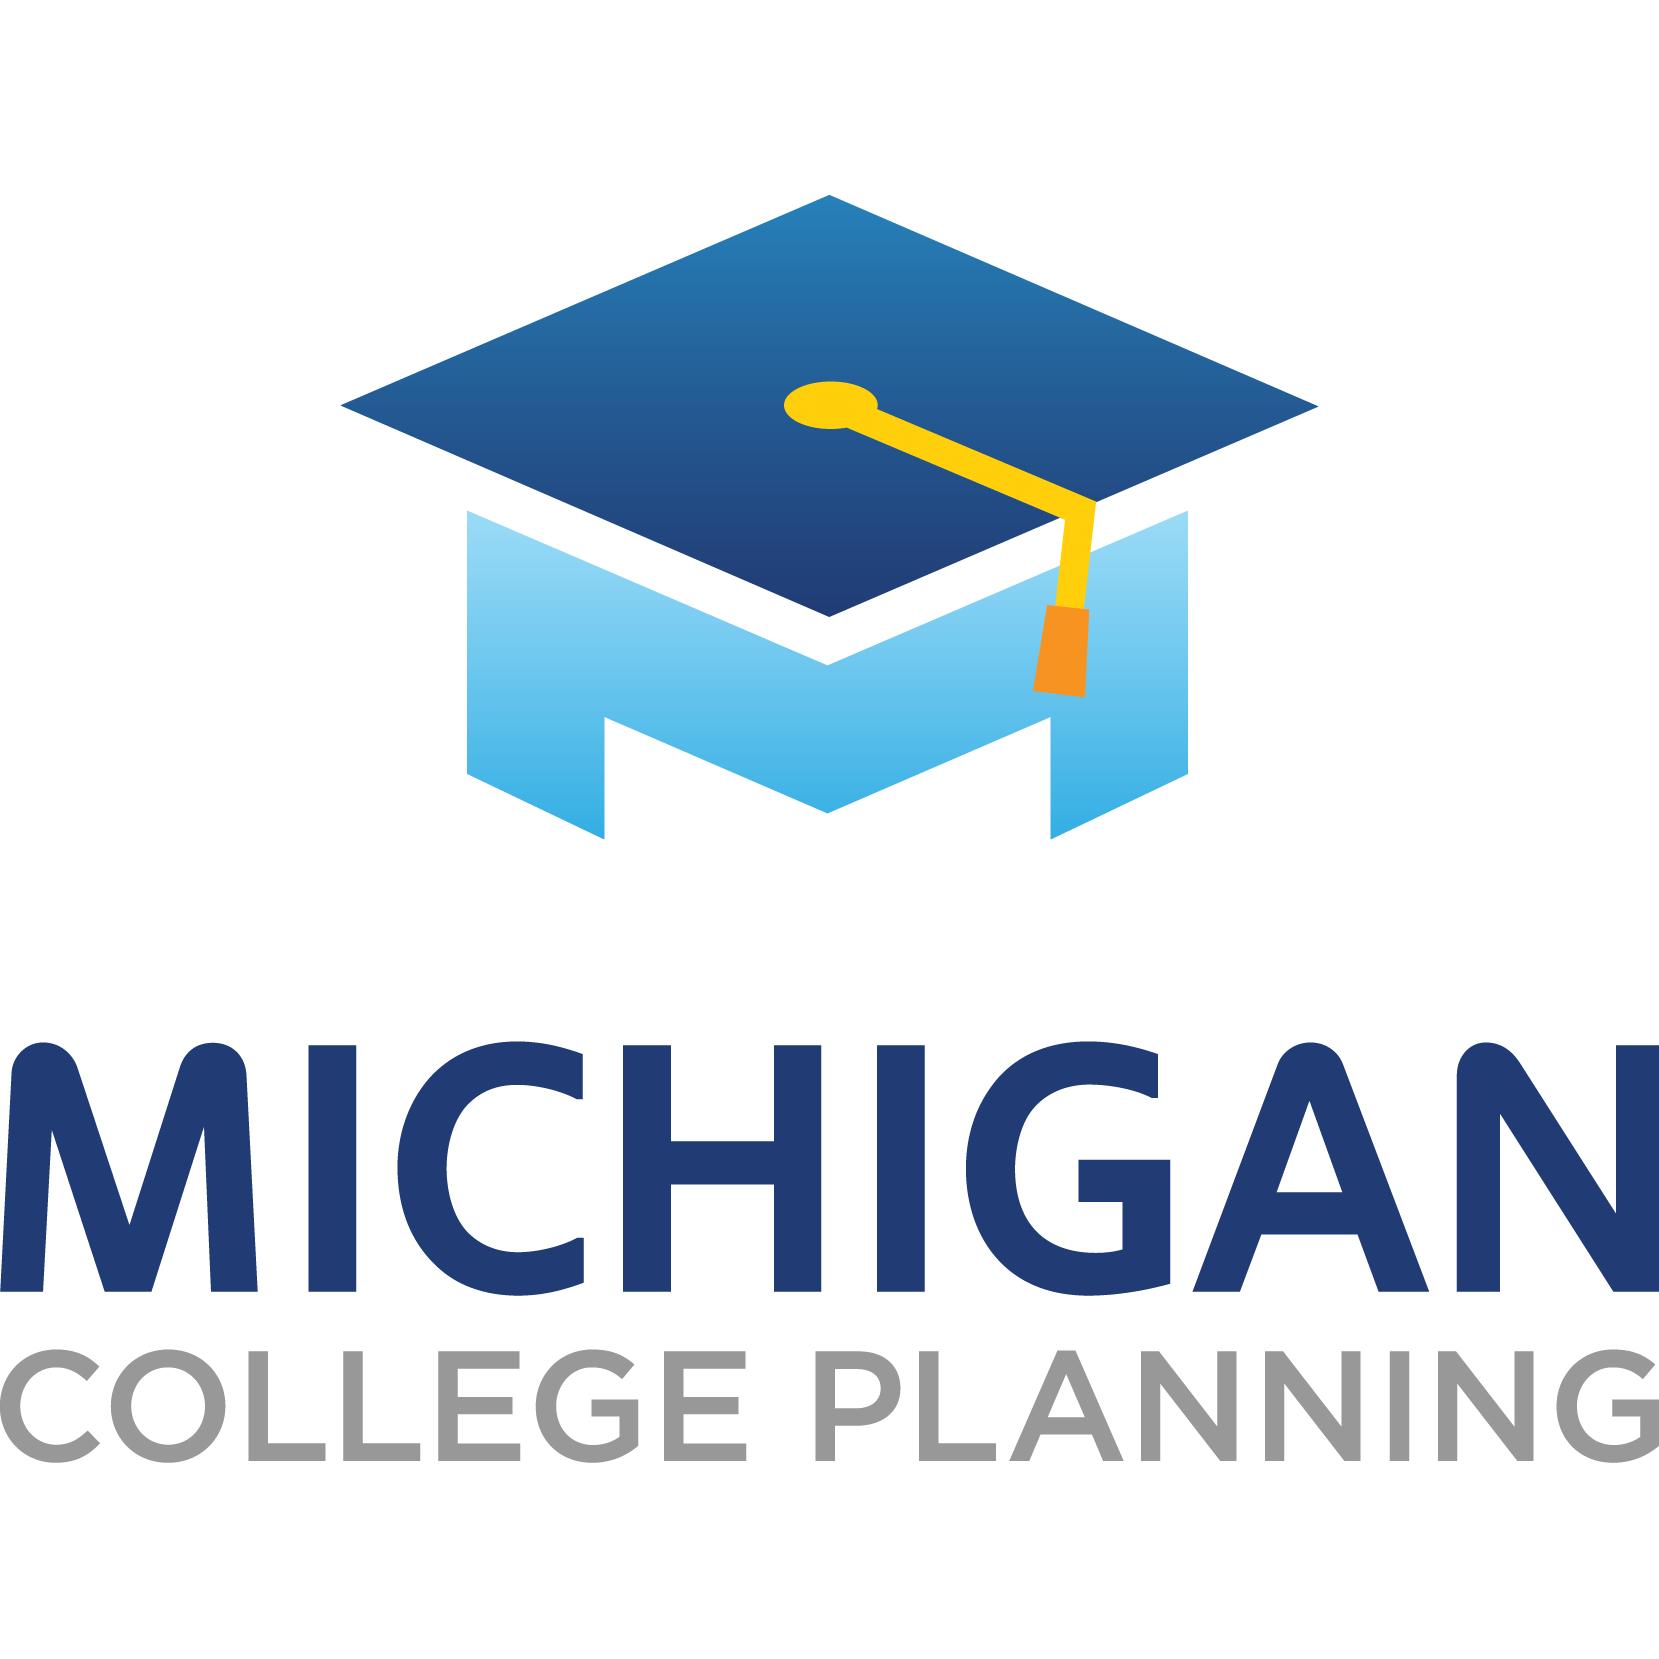 Michigan College Planning